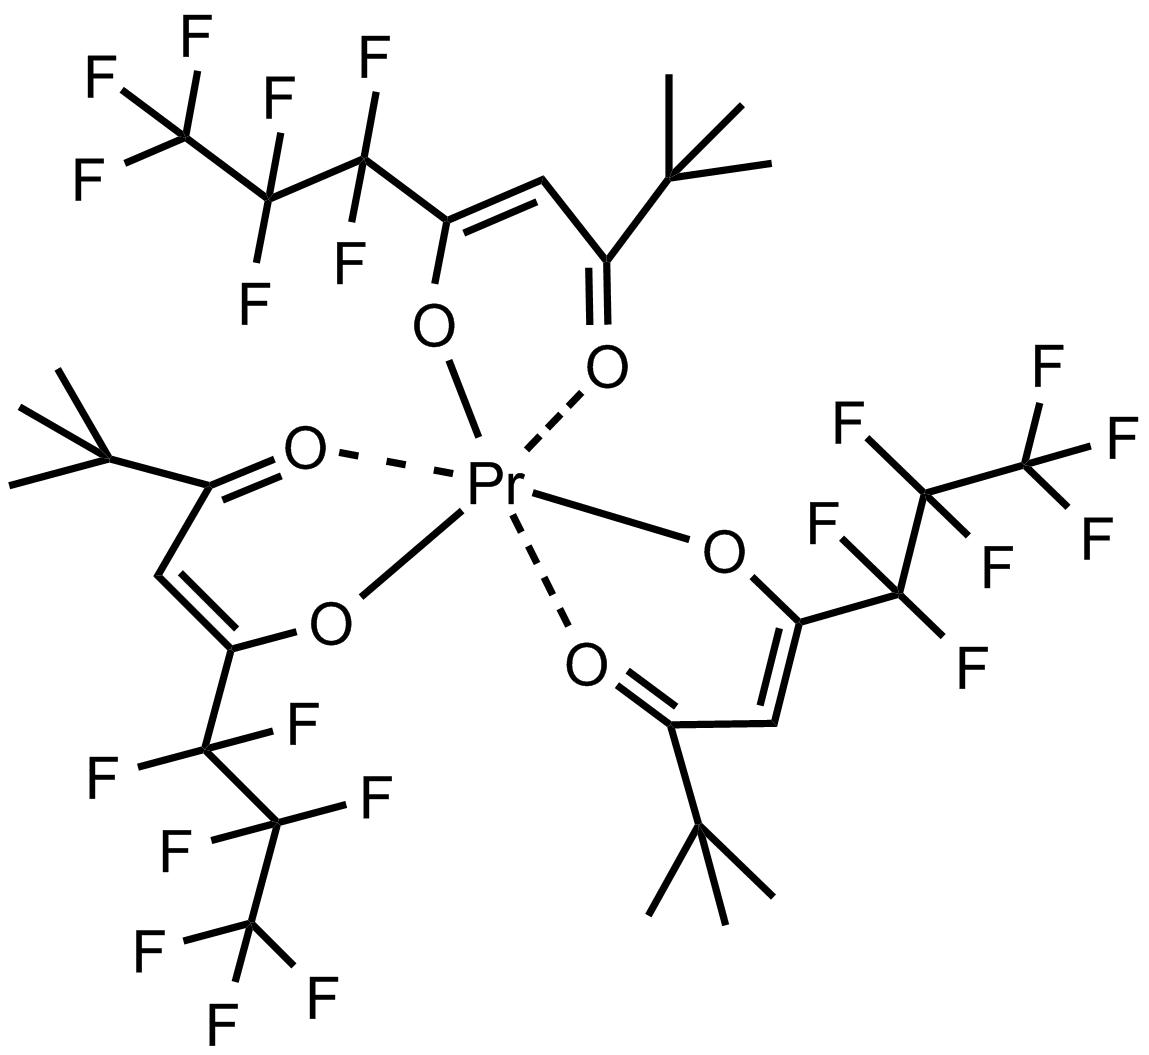 Tris(6,6,7,7,8,8,8-heptafluoro-2,2-dimethyl-3,5-octanedionato)praseodymium(III) [NMR Shift Reagent] 三(6,6,7,7,8,8,8-七氟-2,2-二甲基-3,5-辛二酮基)镨(Ⅲ)[核磁共振位移试剂]